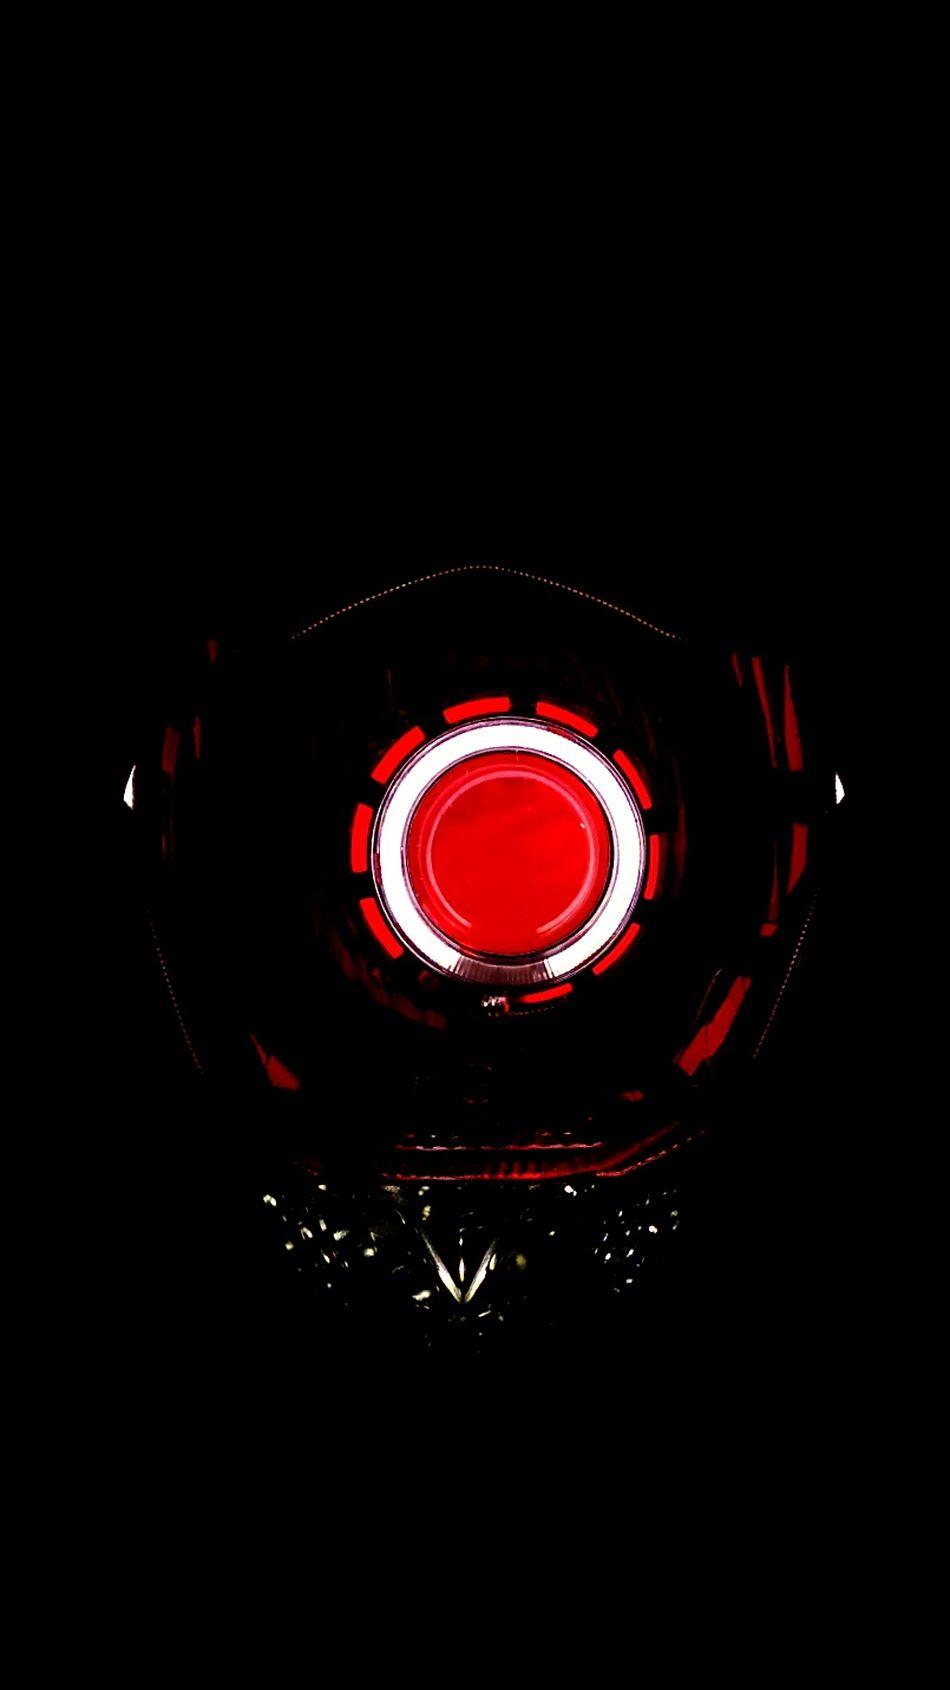 The RedHeart Lights Shadows Red Projector Headlamp Bikes Bikers Suzuki Gixxer Passion Feelgood Nightphotography Photography